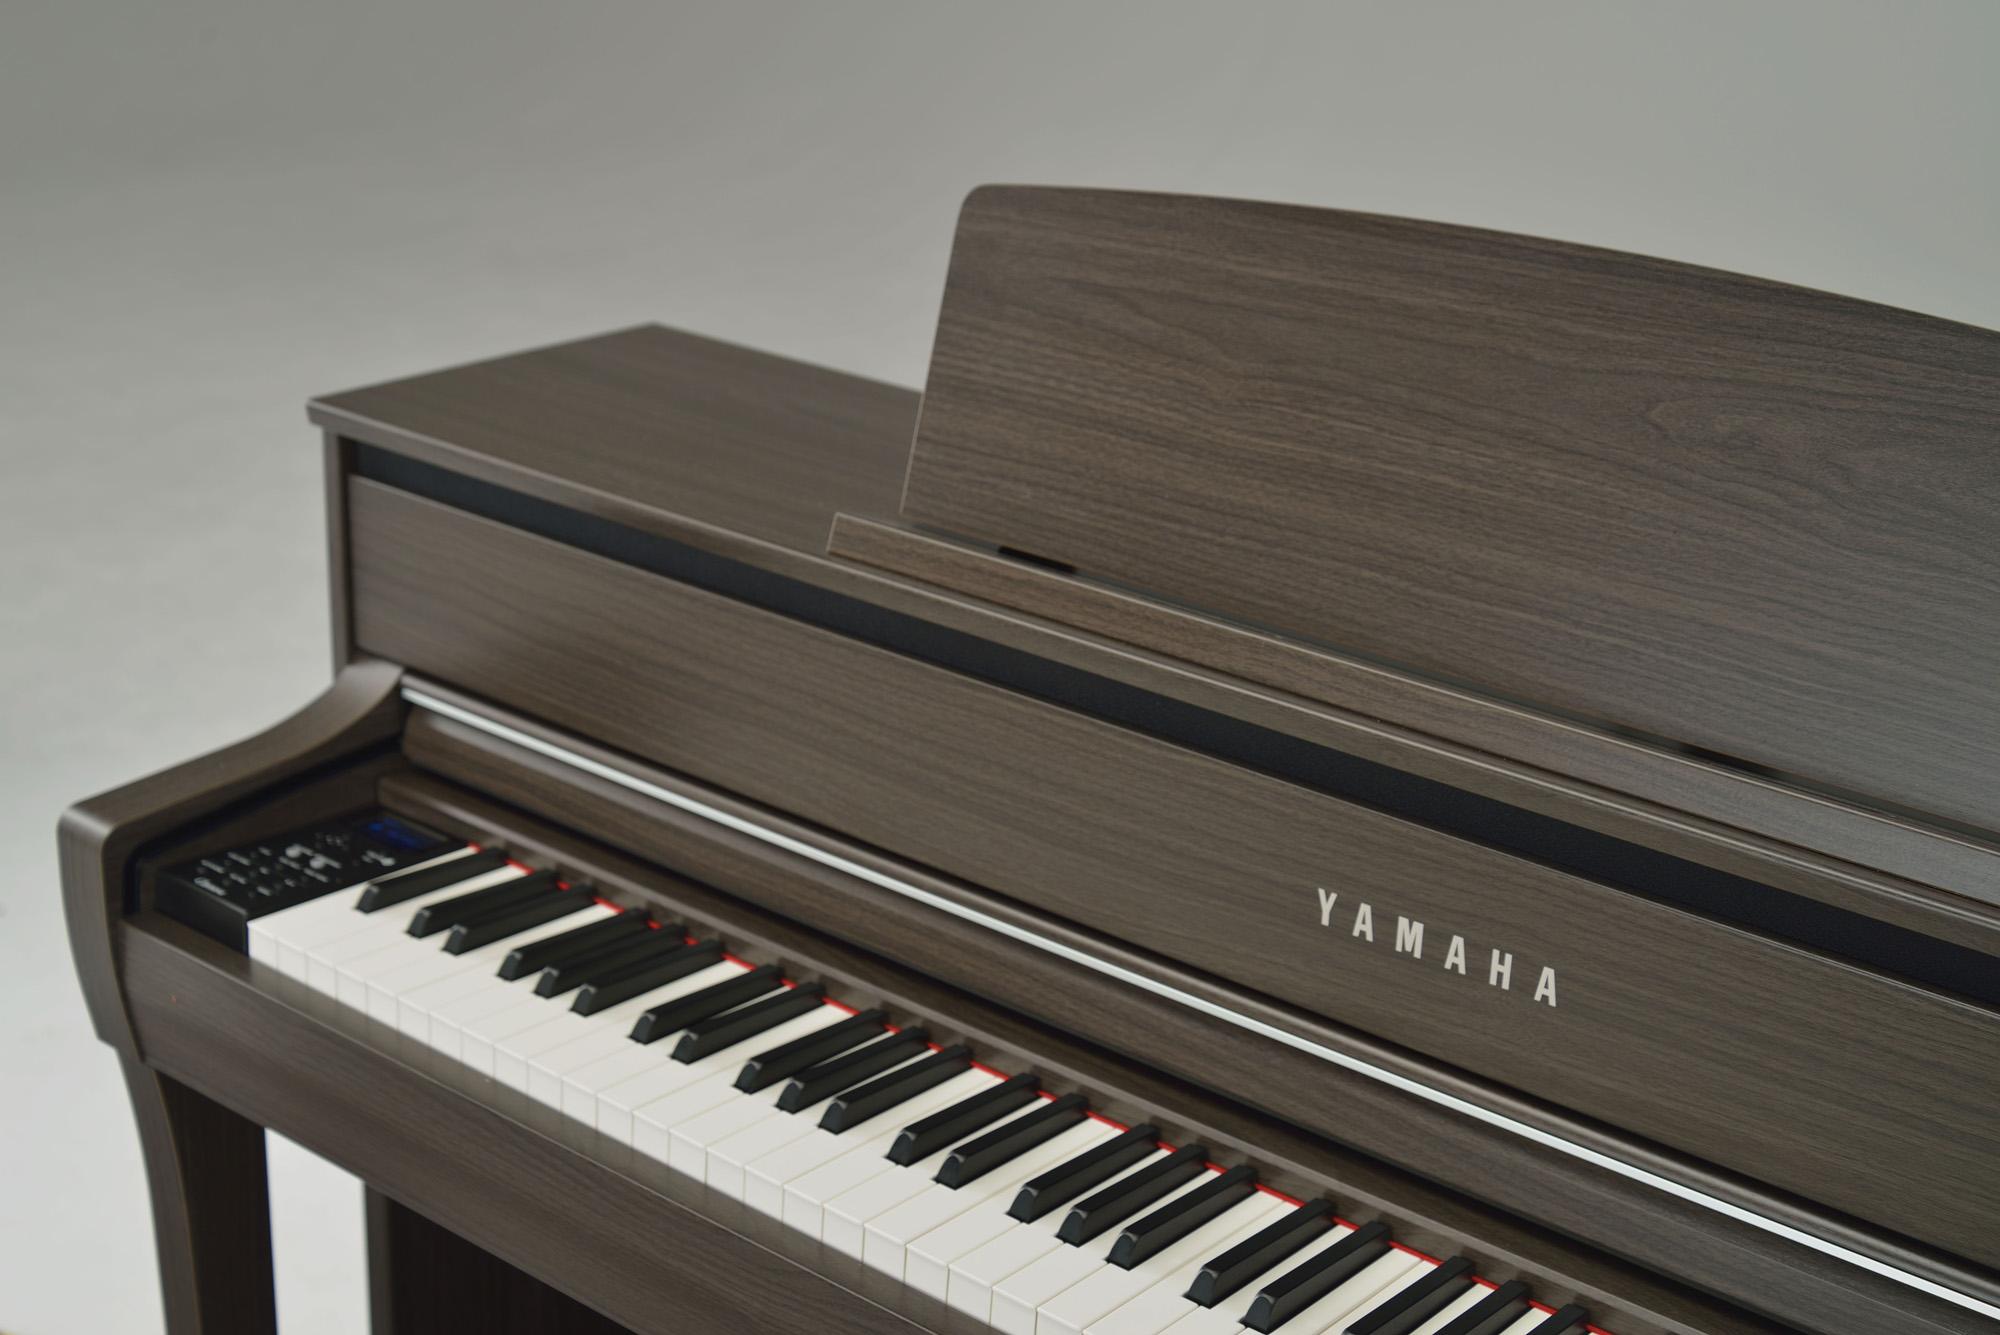 Yamaha Clp 675 Clavinova Digital Piano In Dark Walnut